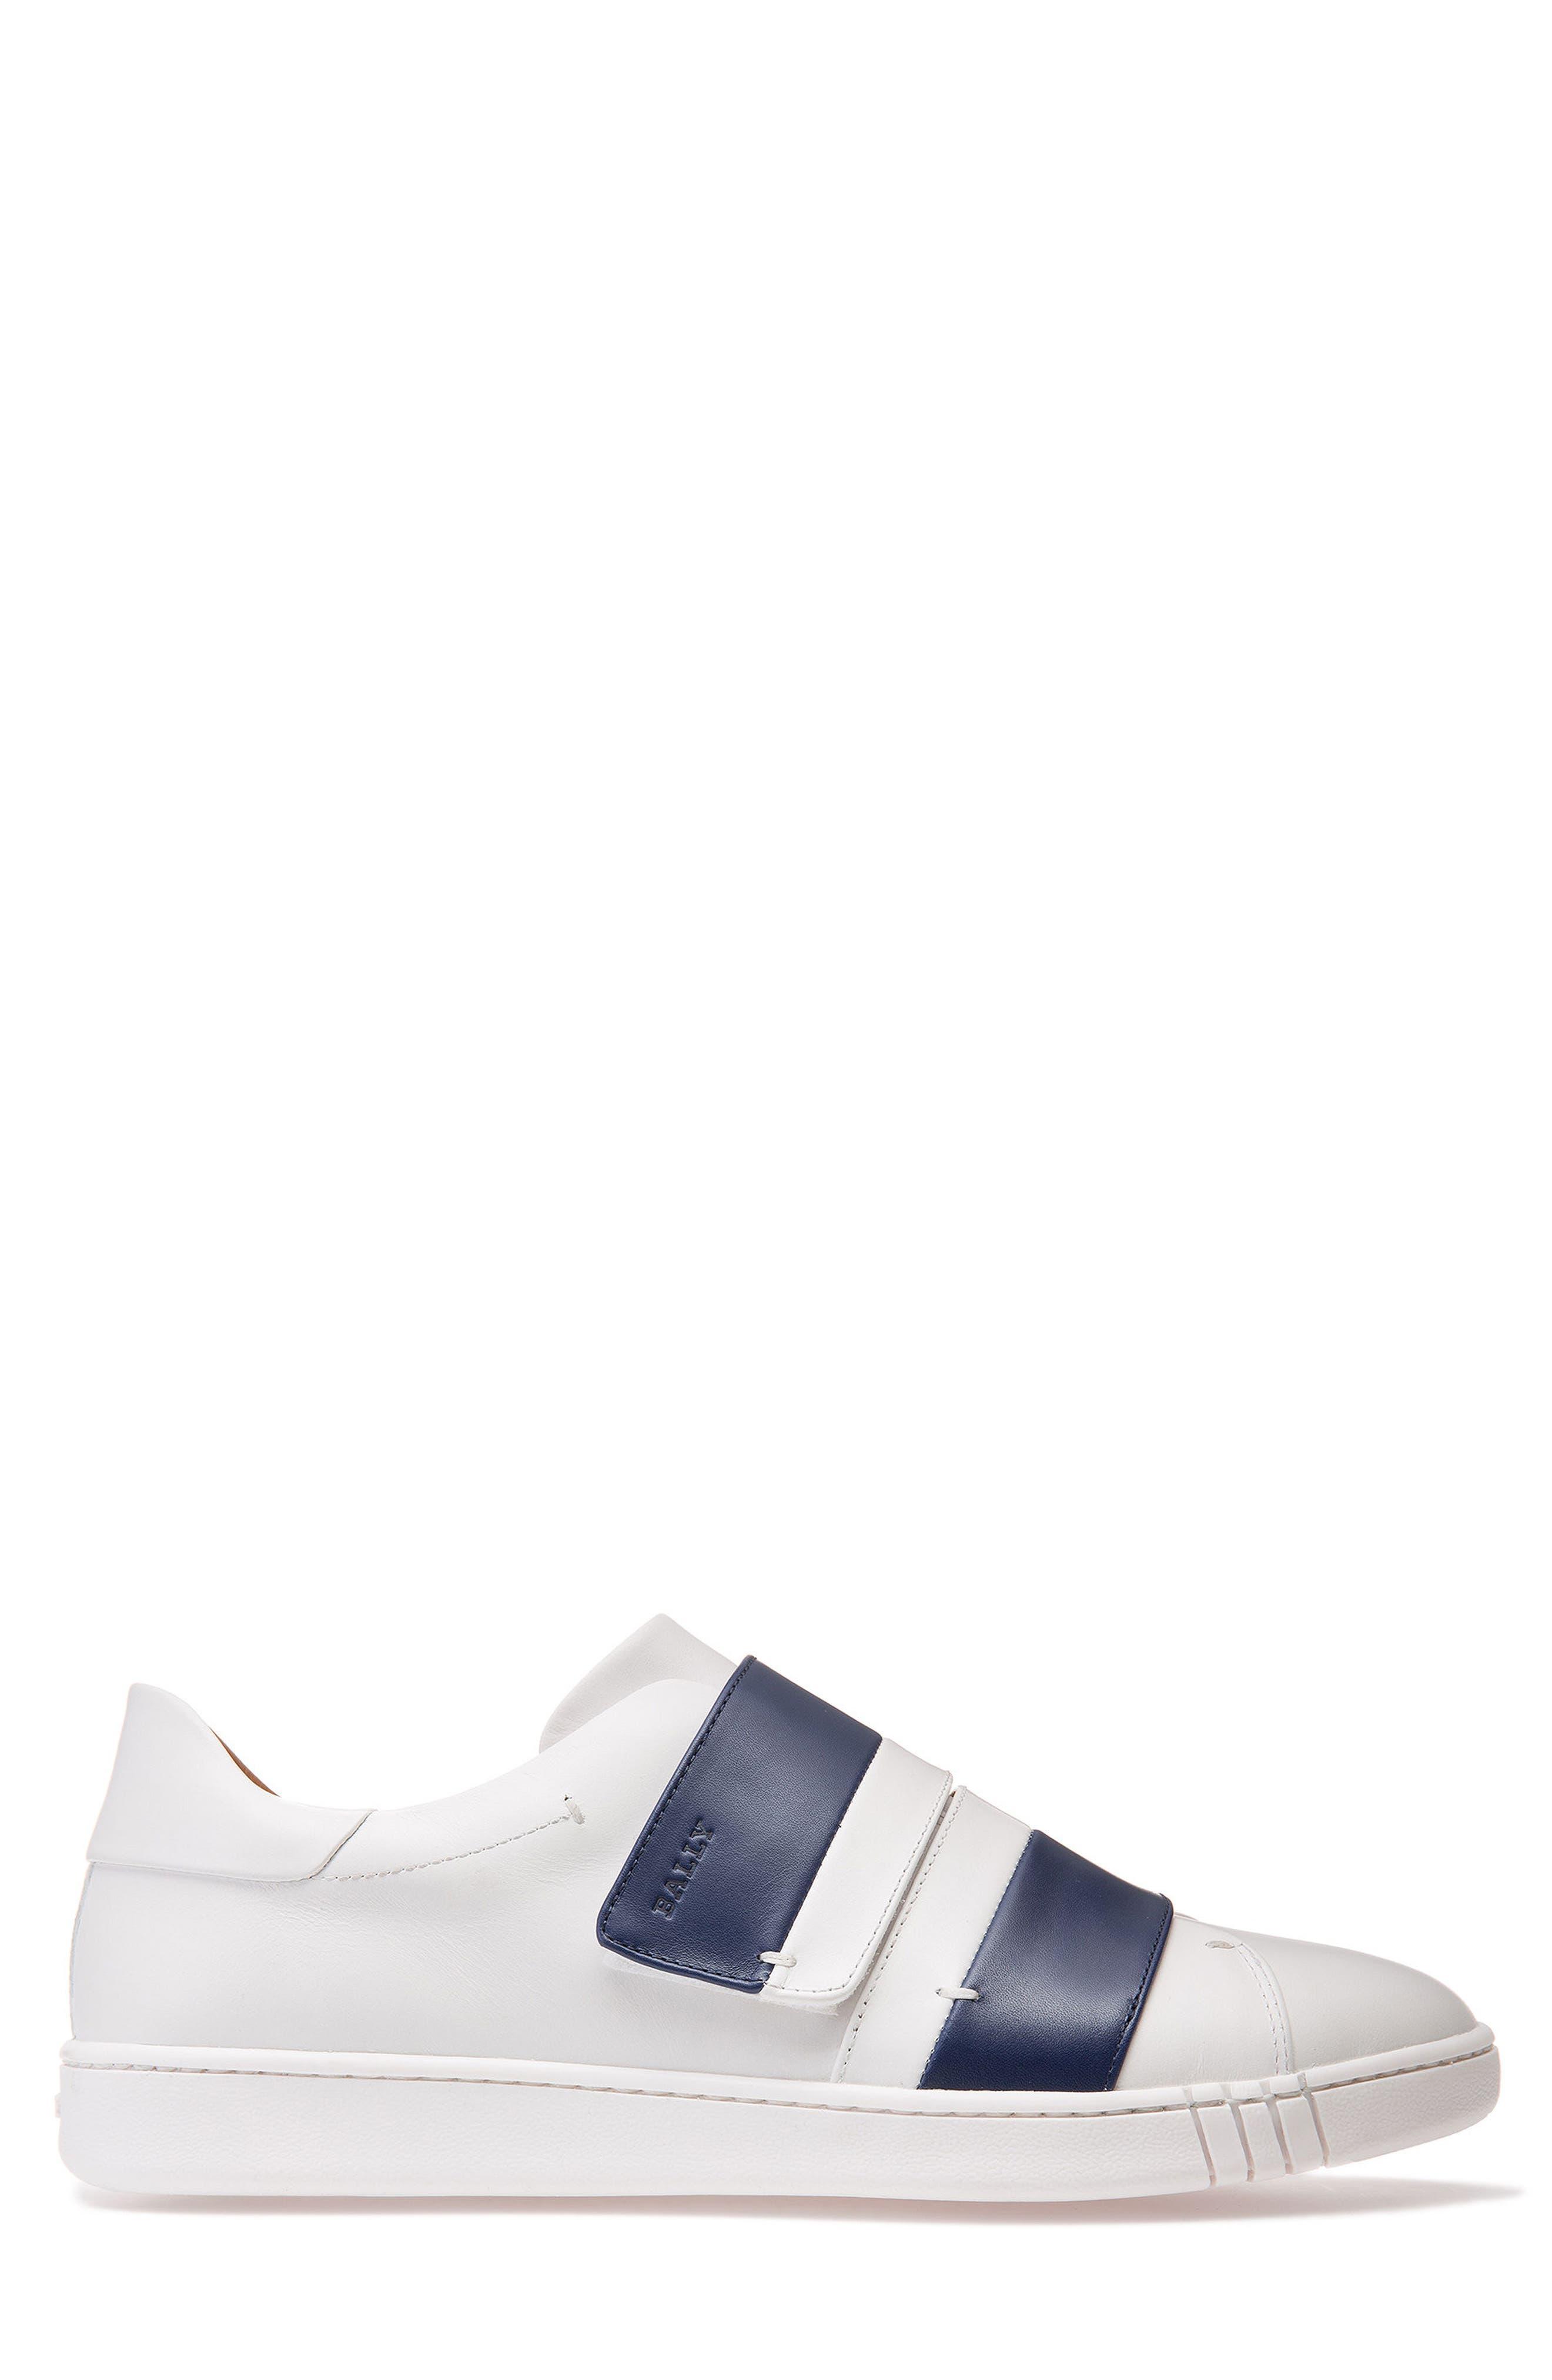 Willet Sneaker,                         Main,                         color, 100